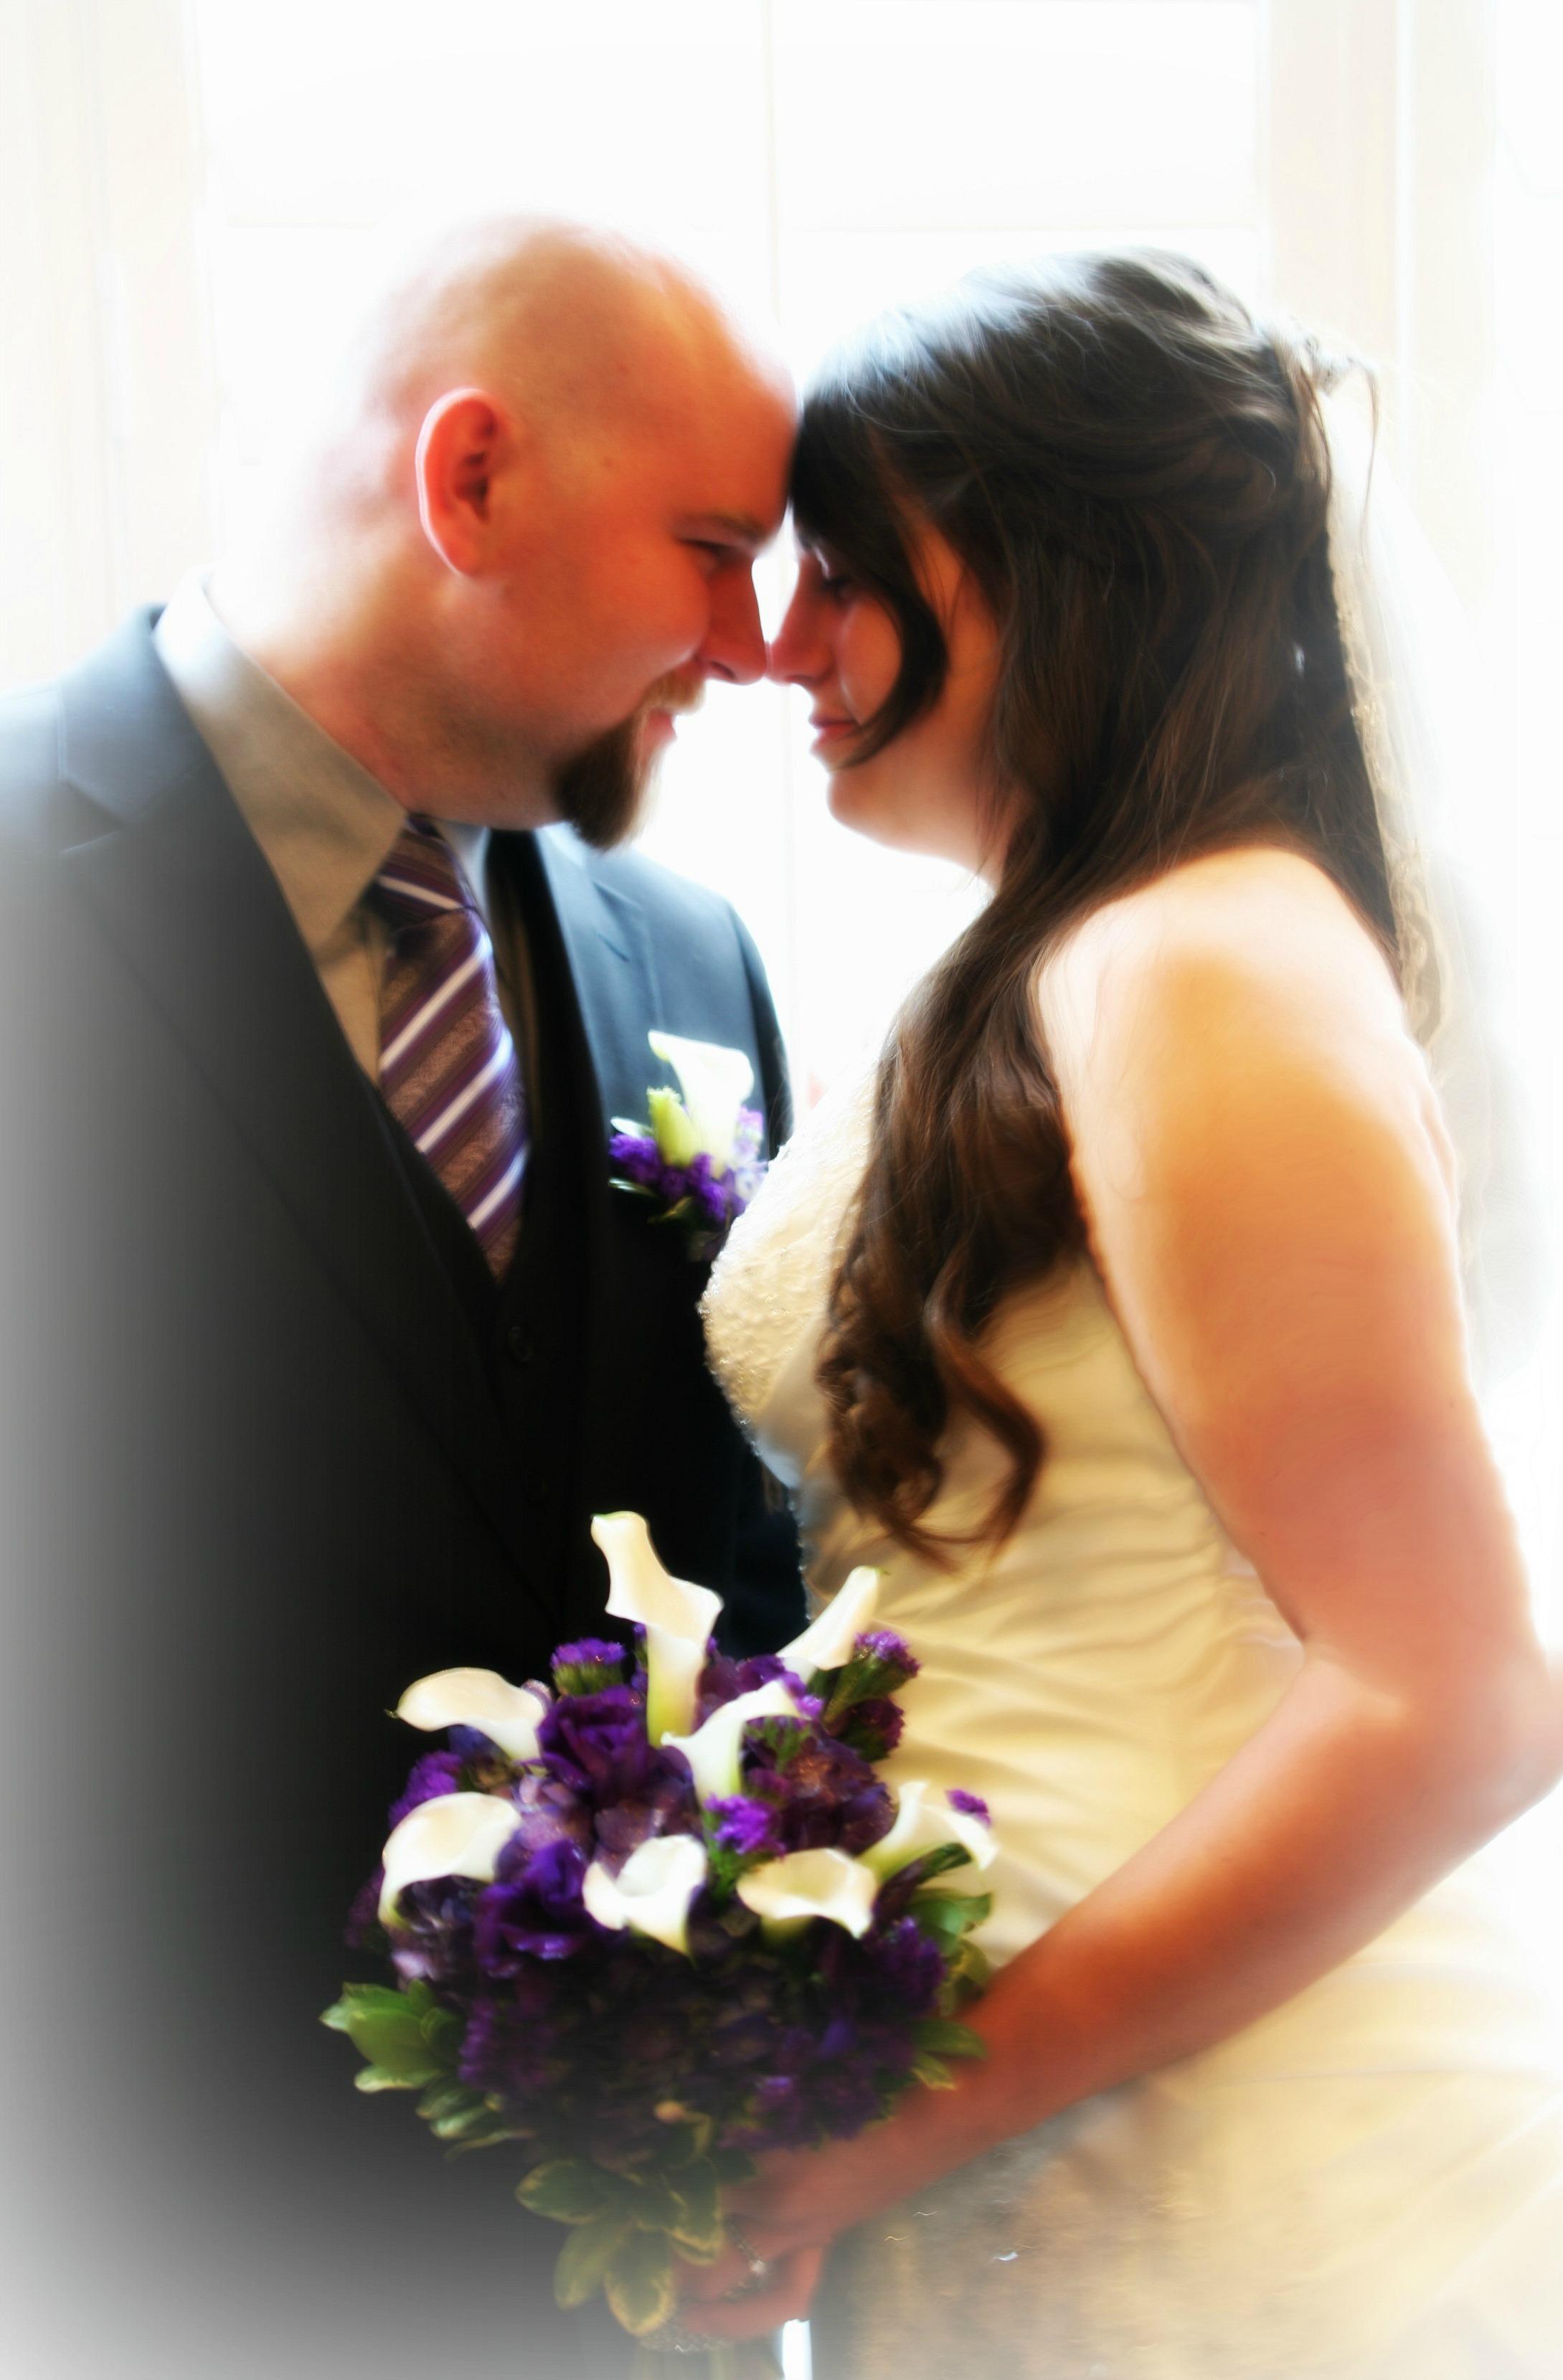 Bountiful wedding photography at Bountiful reception center